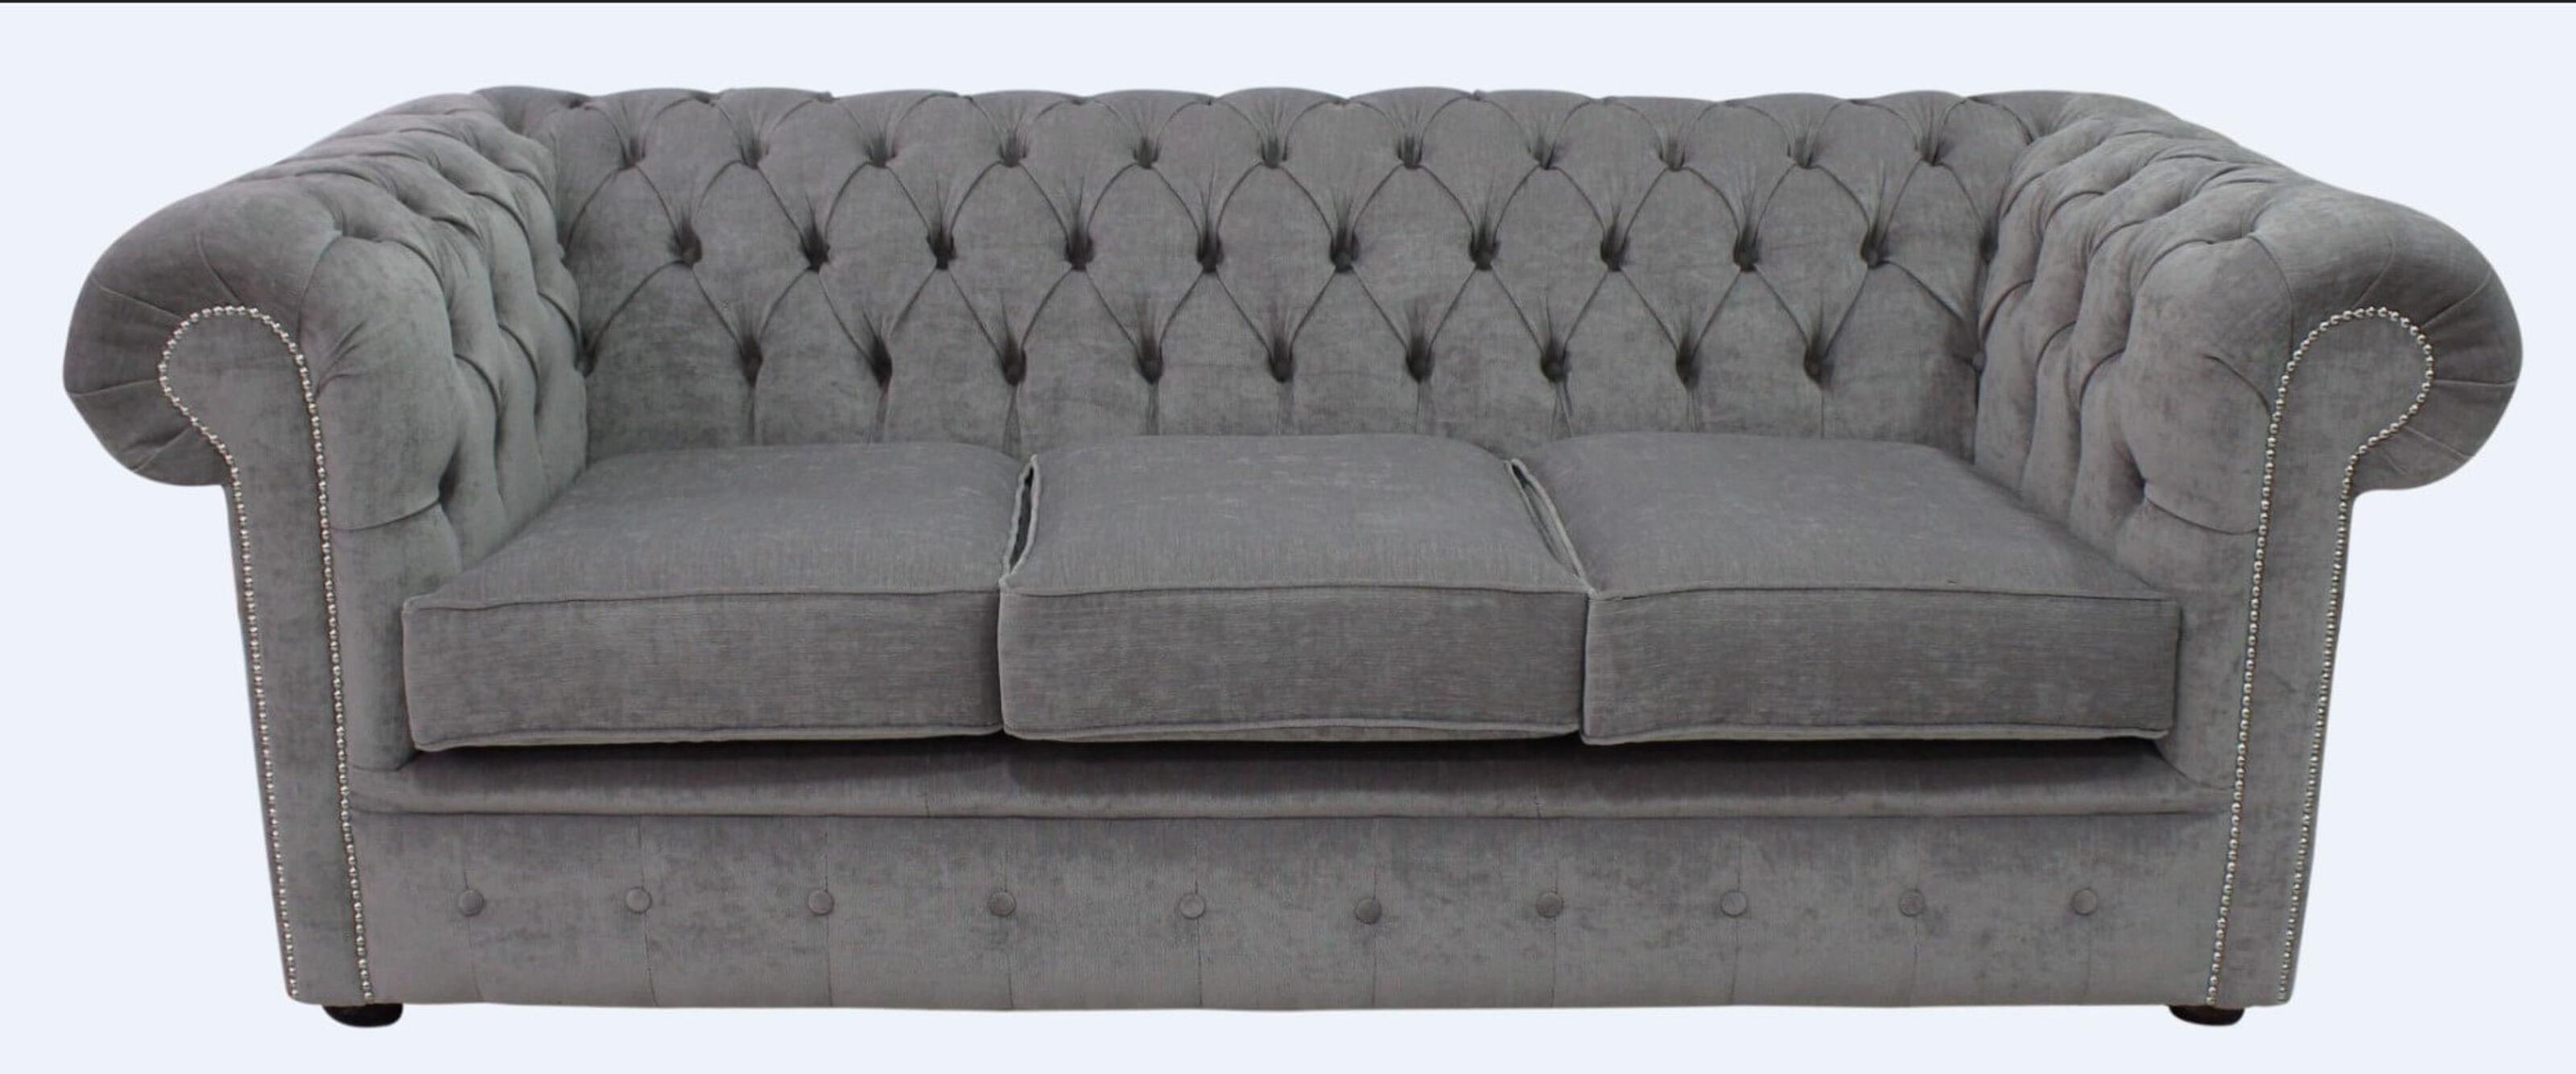 Grey Fabric Chesterfield Sofa Designersofas4u